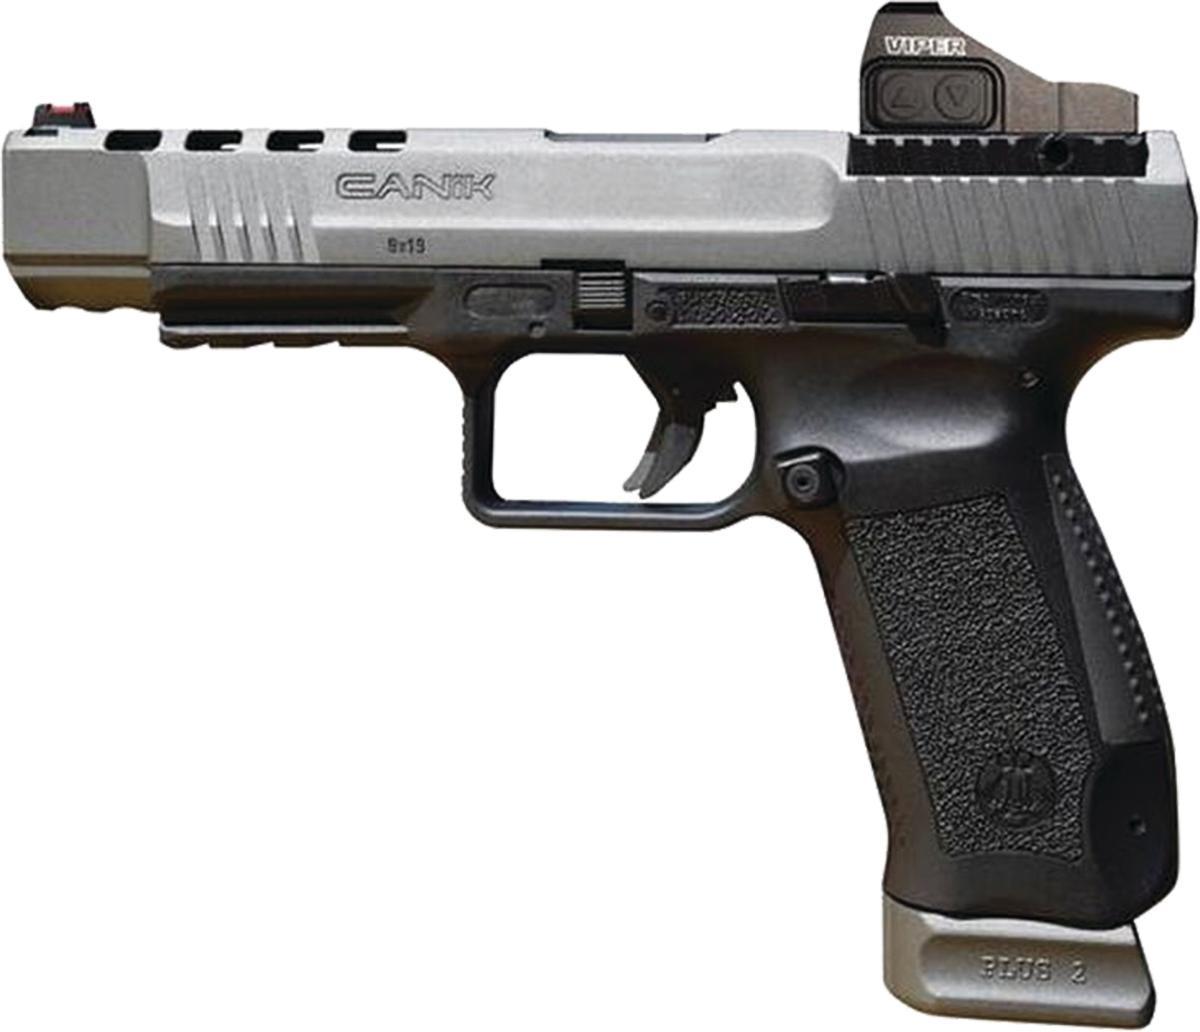 "CANIK TP9SFX 9MM TUNG 5"" VIPER FULL ACCESSORY PACK 9mm"